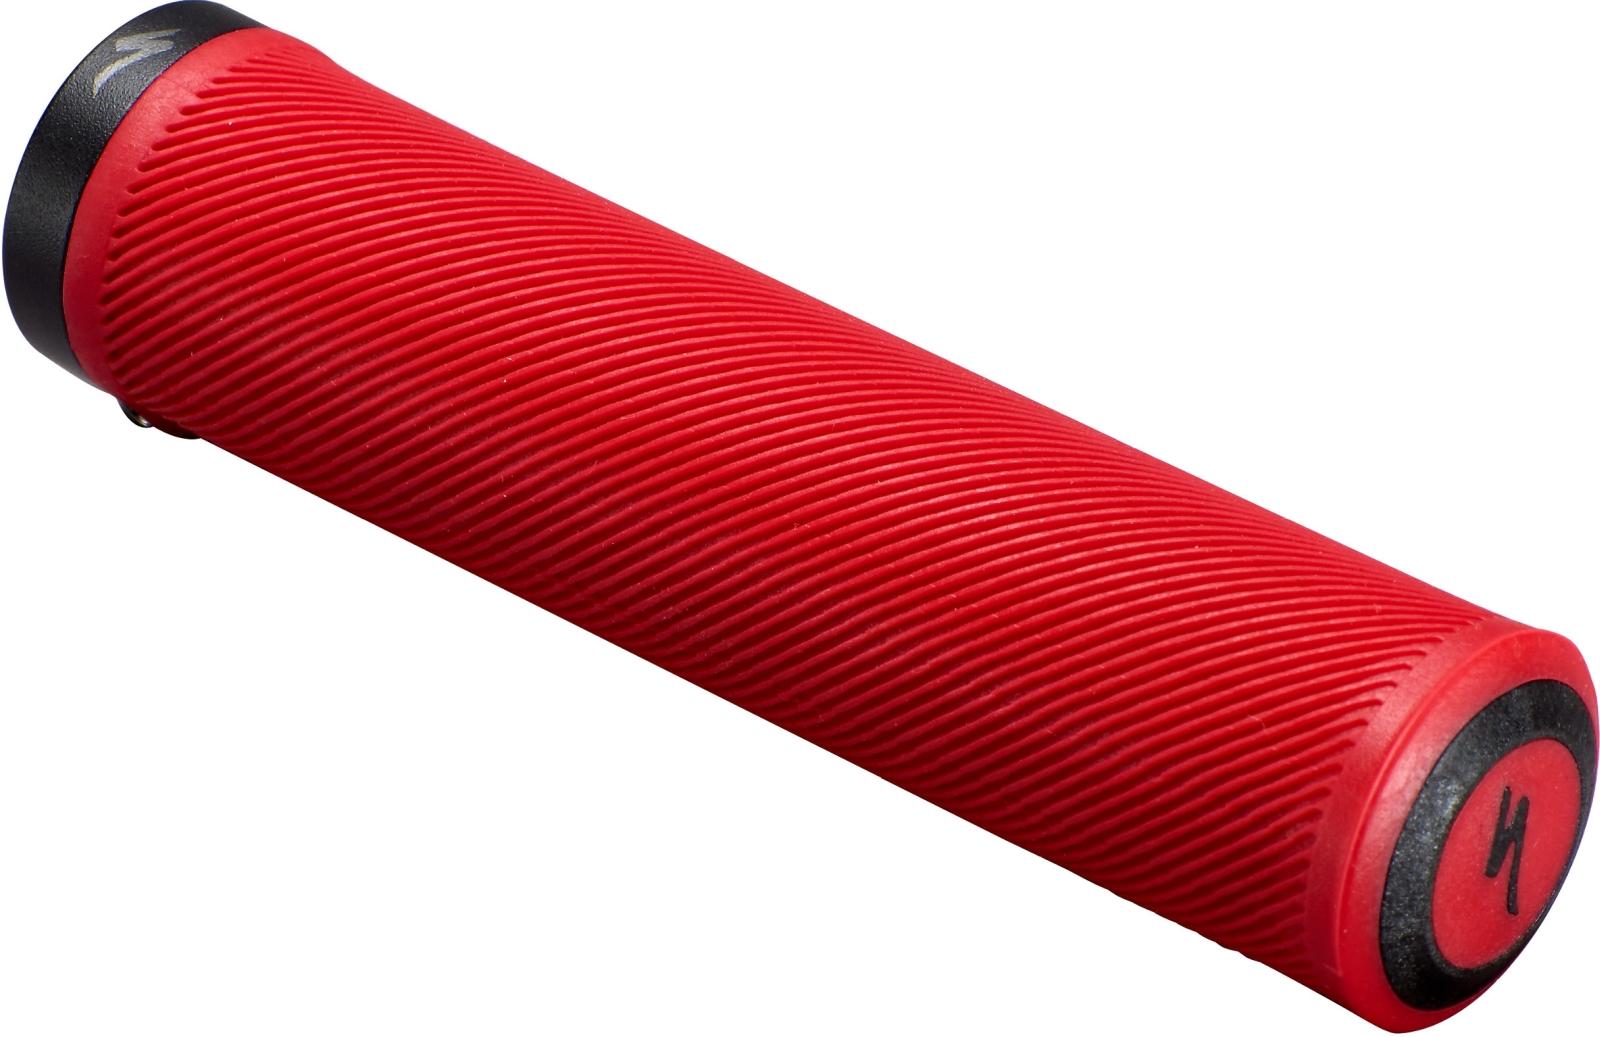 Specialized Trail grip S/M - red uni